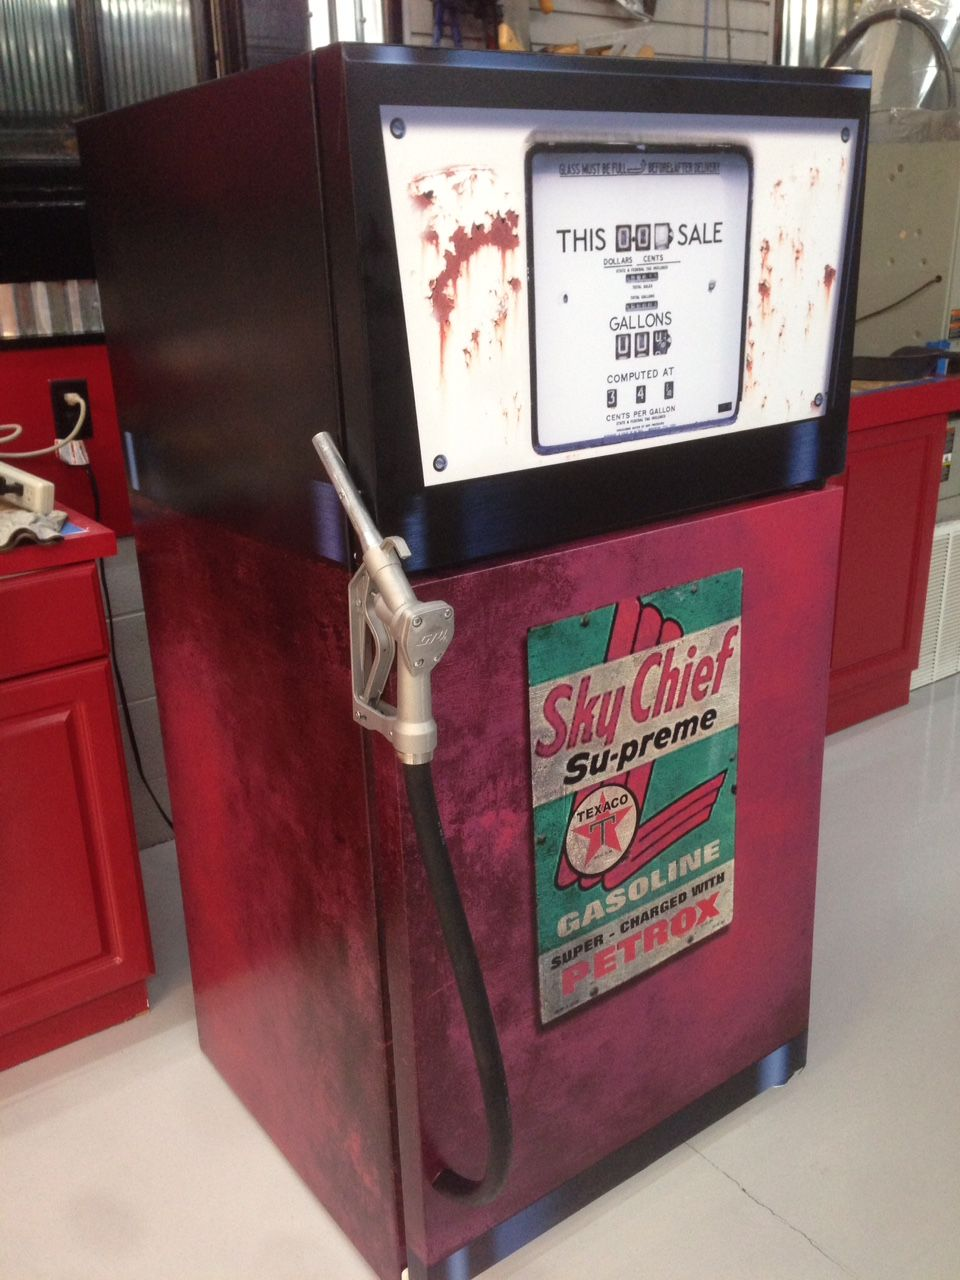 Vintage Gas Pump Refrigerator Wrap Rm Wraps Vintage Refrigerator Vintage Gas Pumps Refrigerator Wraps